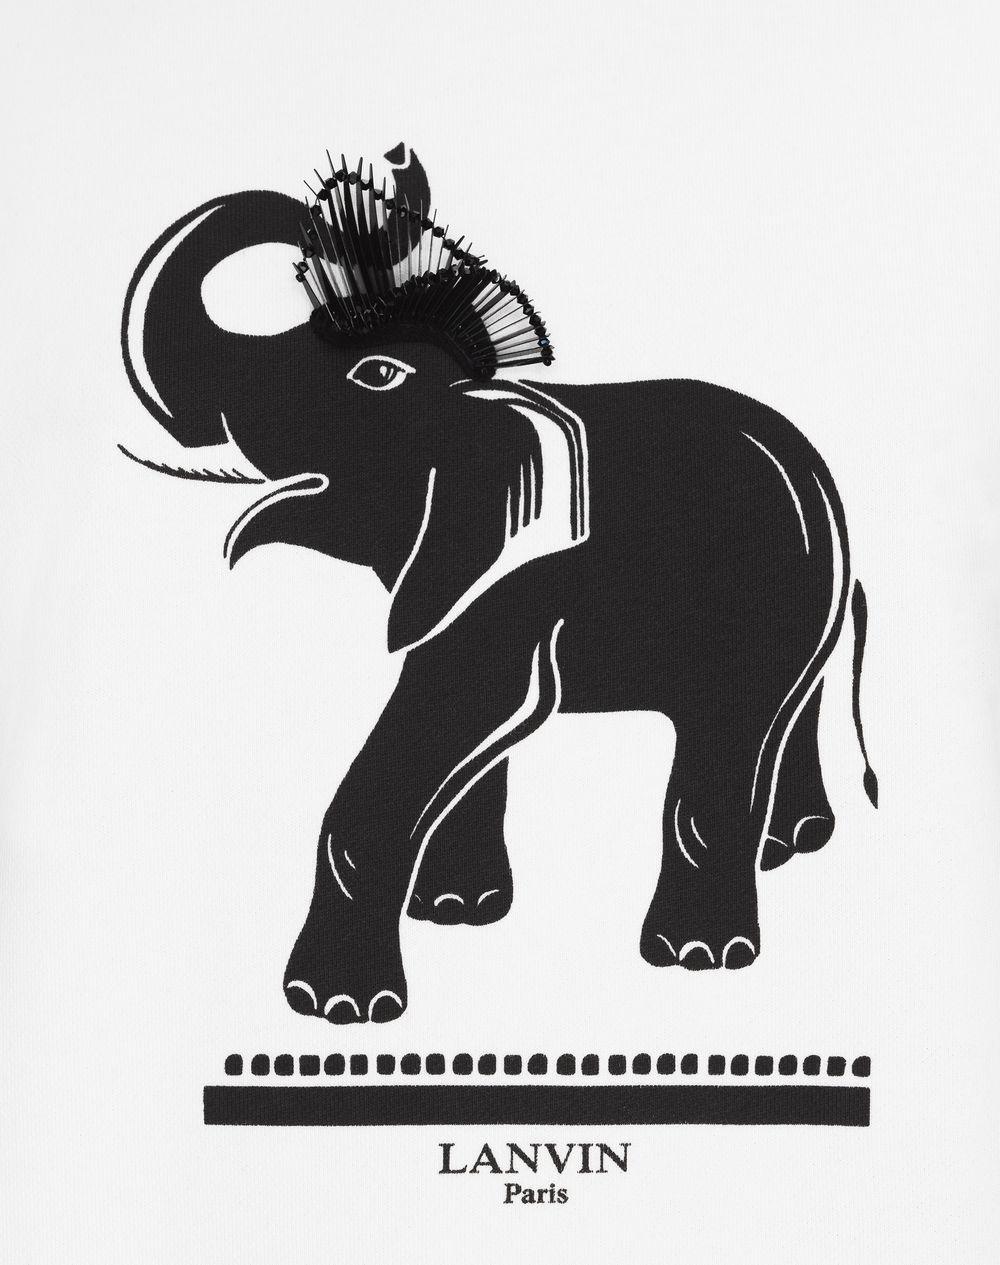 ELEPHANT PRINT JERSEY SWEATER - Lanvin